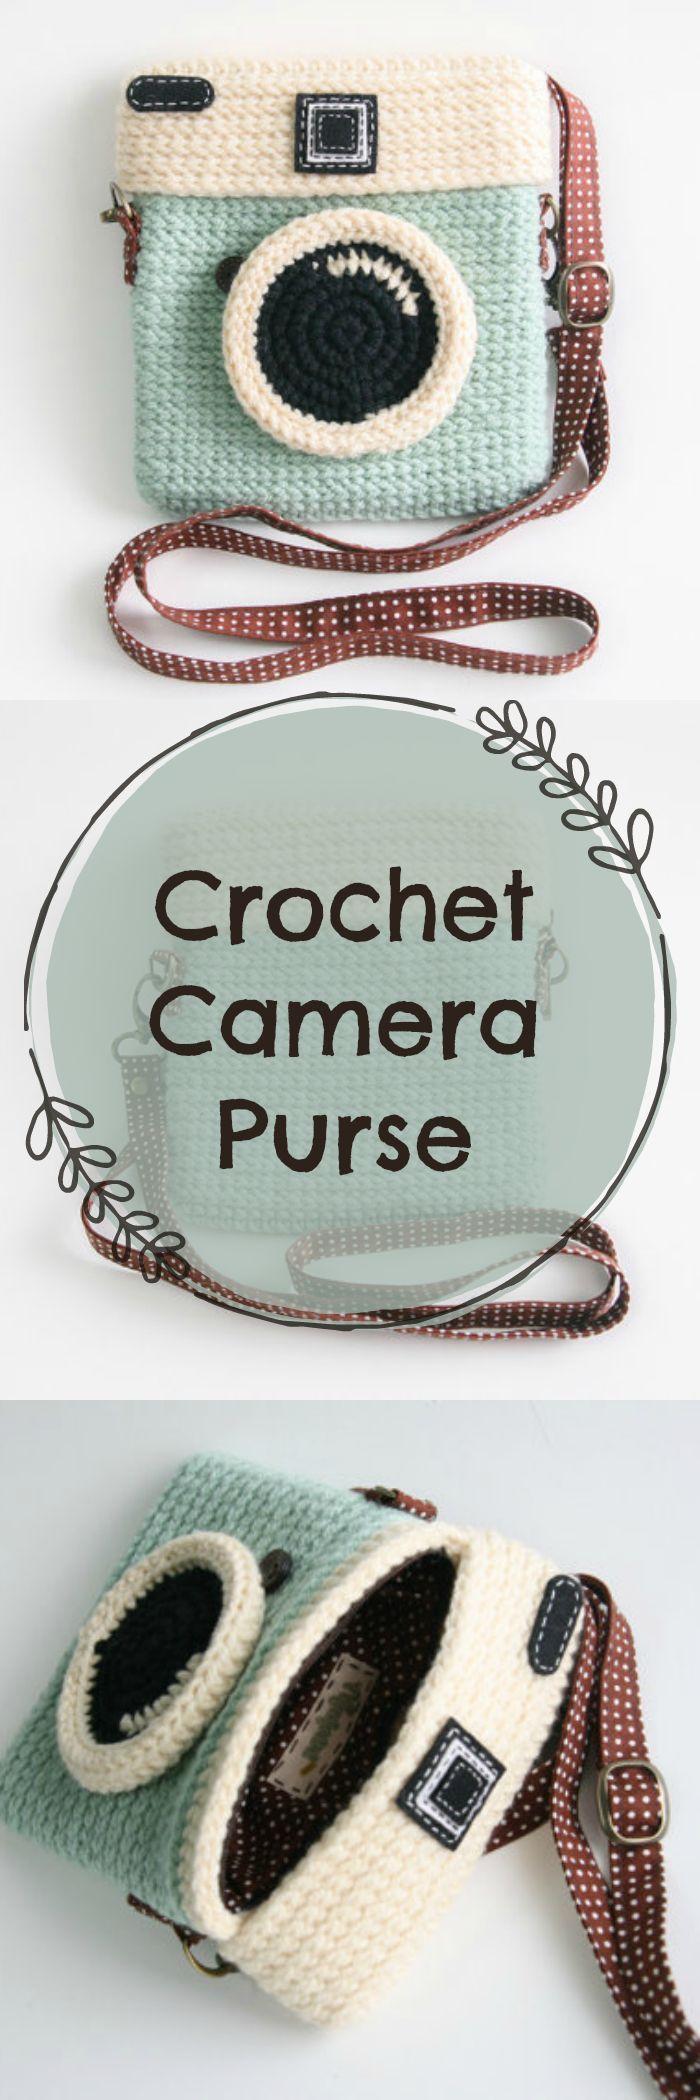 c1477fffeca7 Therese Pilger | 包 | Crochet, Crochet camera, Crochet gifts